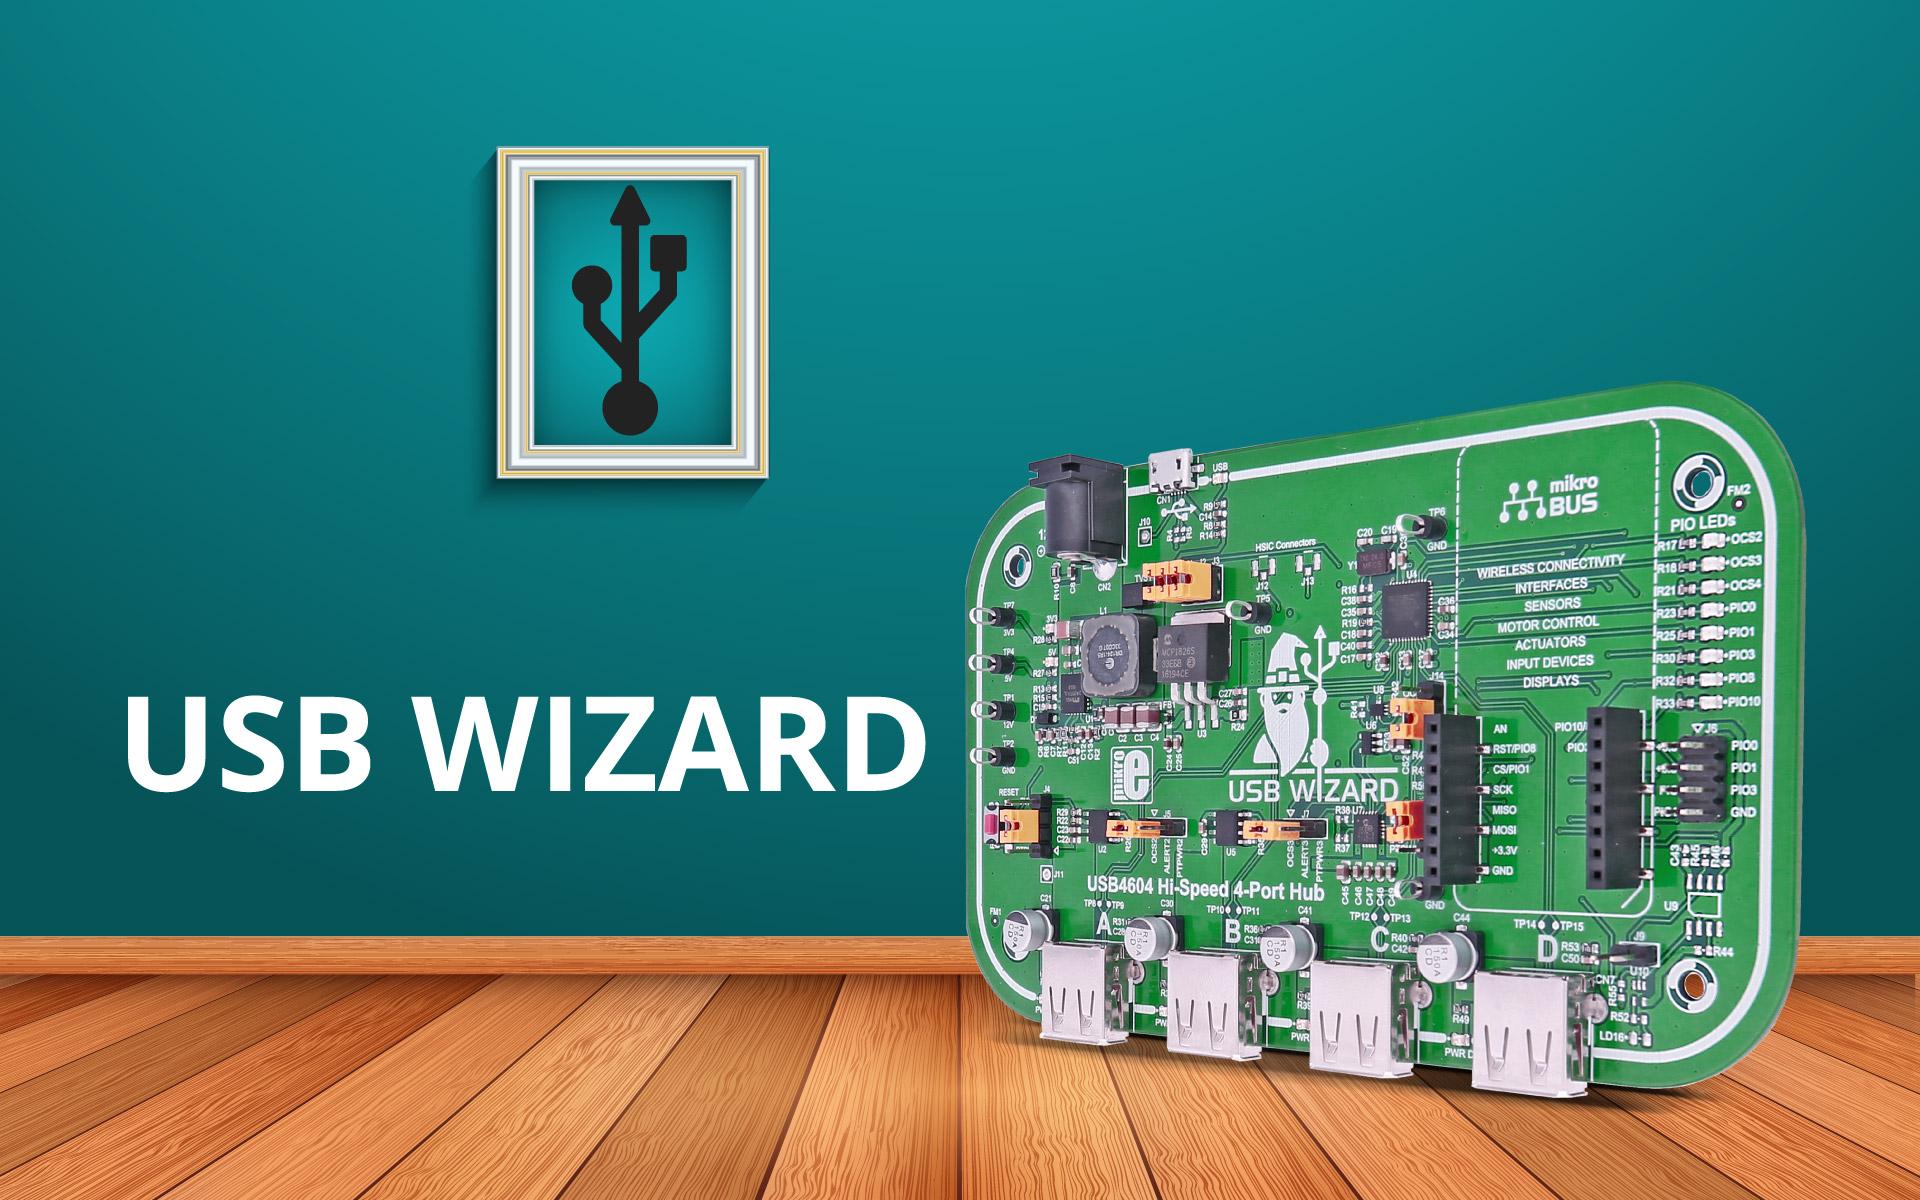 USB Wizard - USB hub with a mikroBUS™ socket